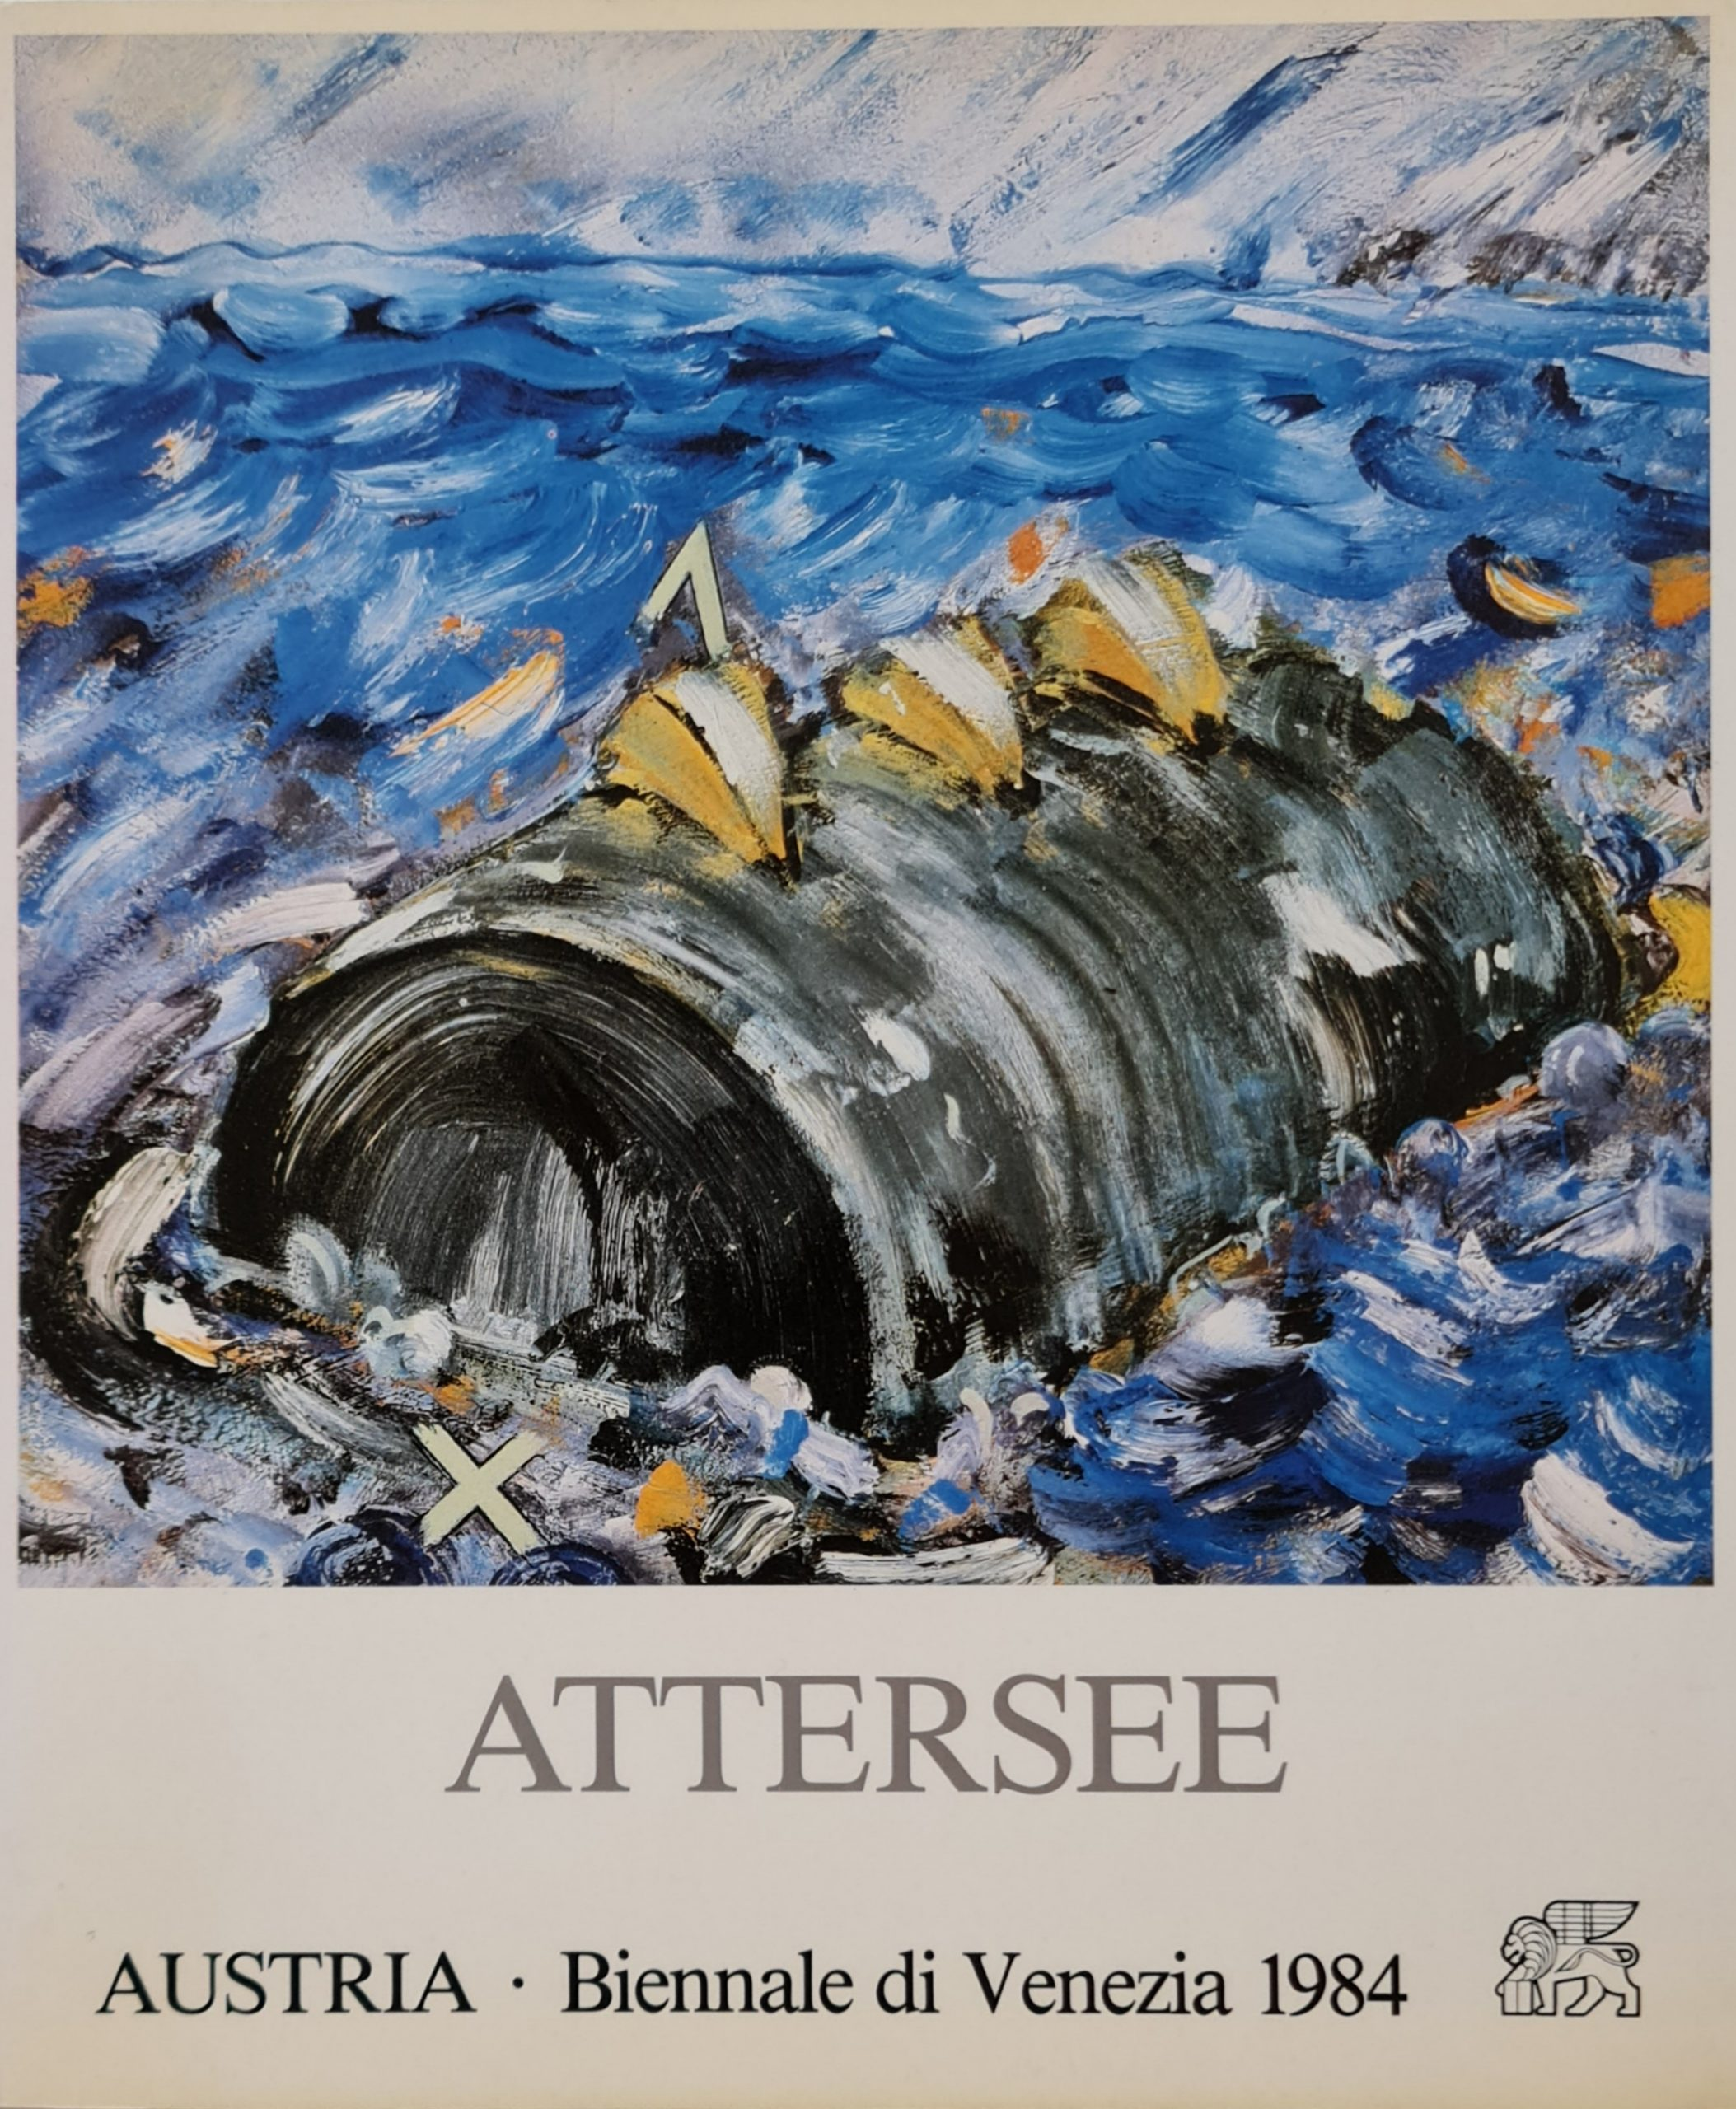 christian attersee artbook christian attersee kunstboek christian attersee boek christian Attersee Austria biennale di Venezia 1984 skoander.com